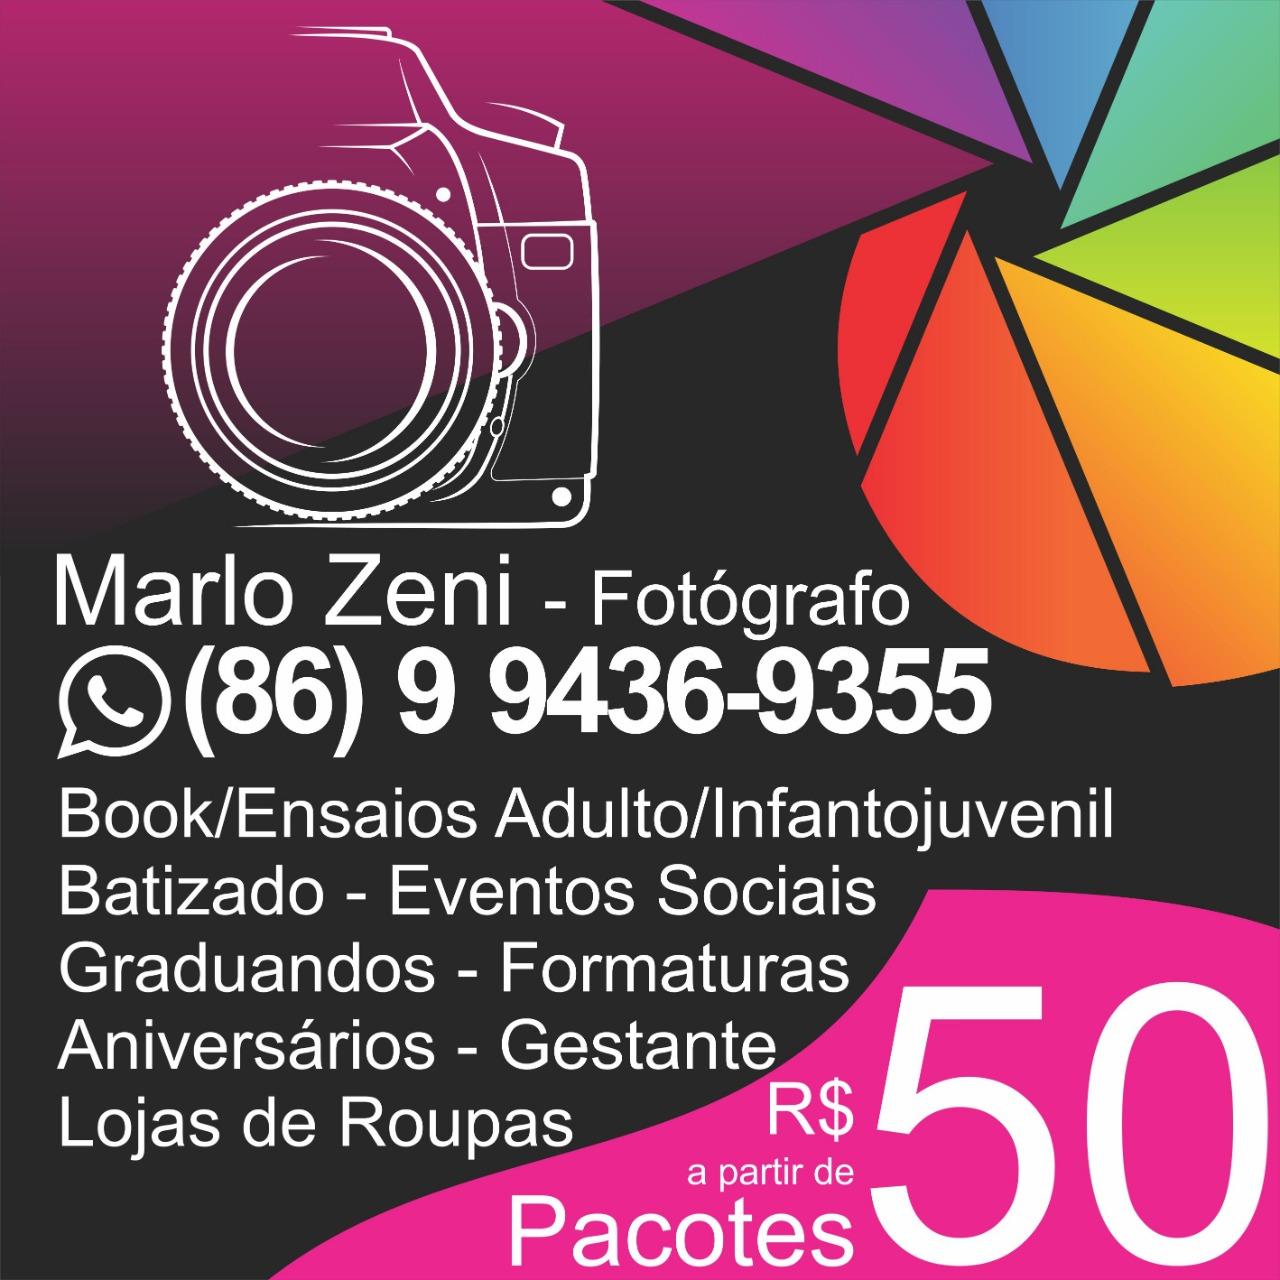 MARLO ZENI-FOTÓGRAFO